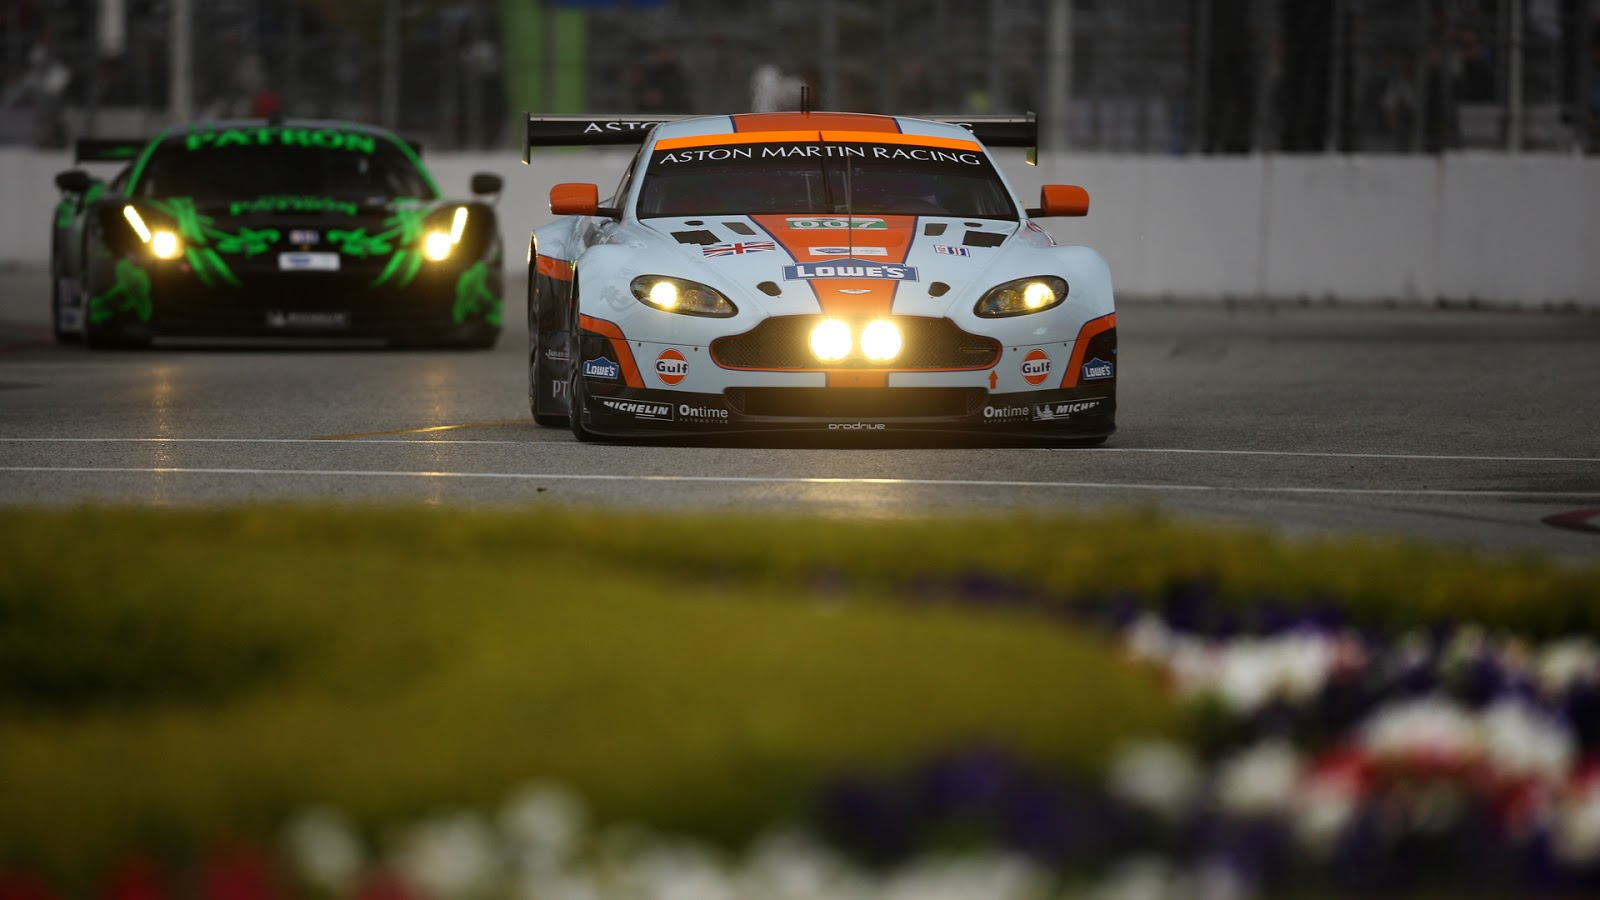 Wallpaper hd : Aston Martin Racing